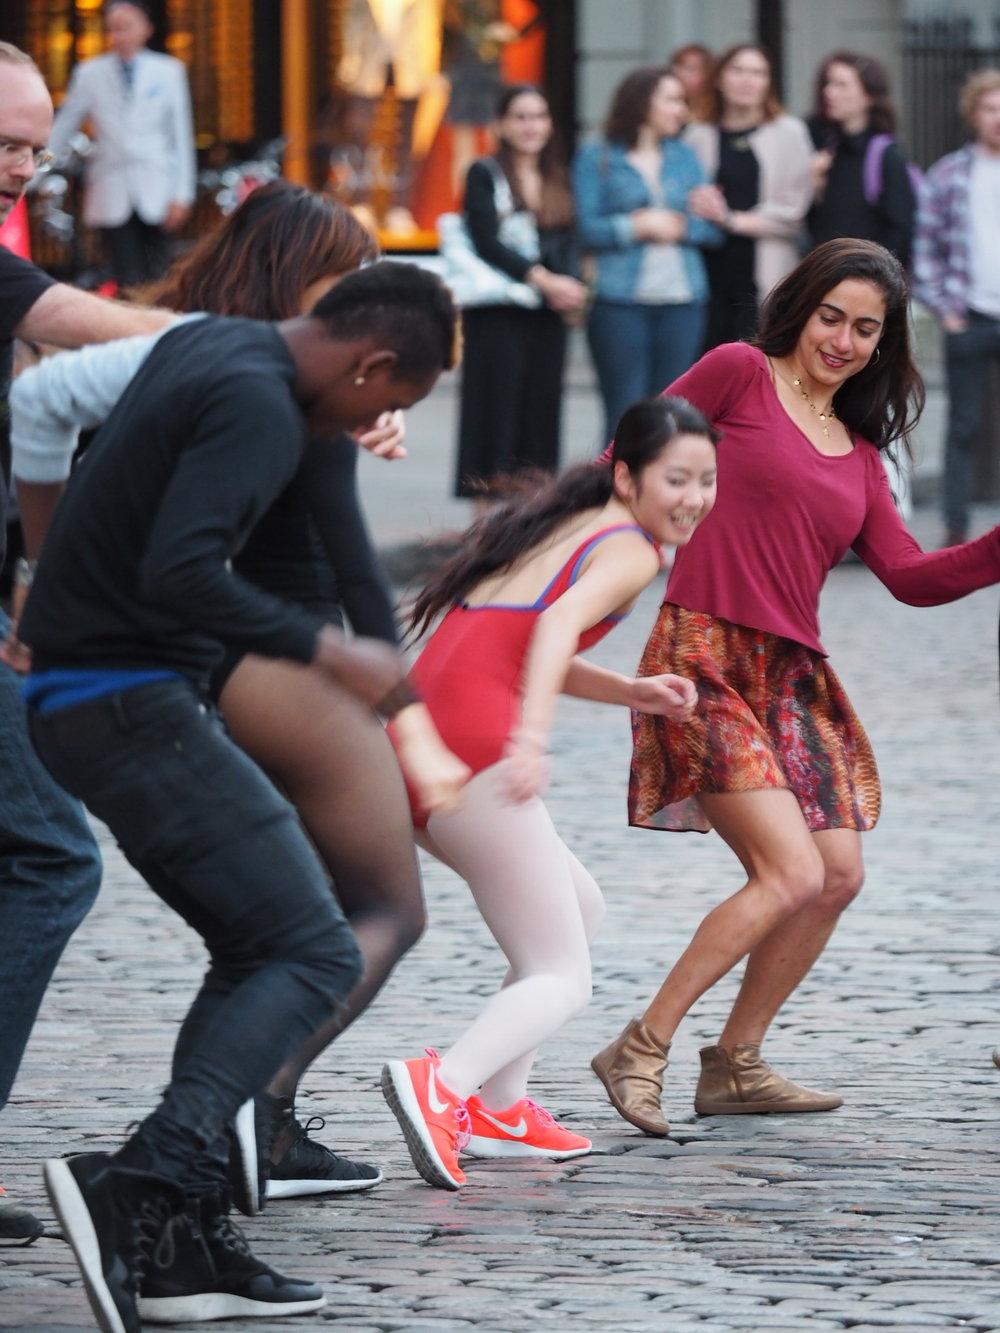 Dance Performance for ArtNight 2016